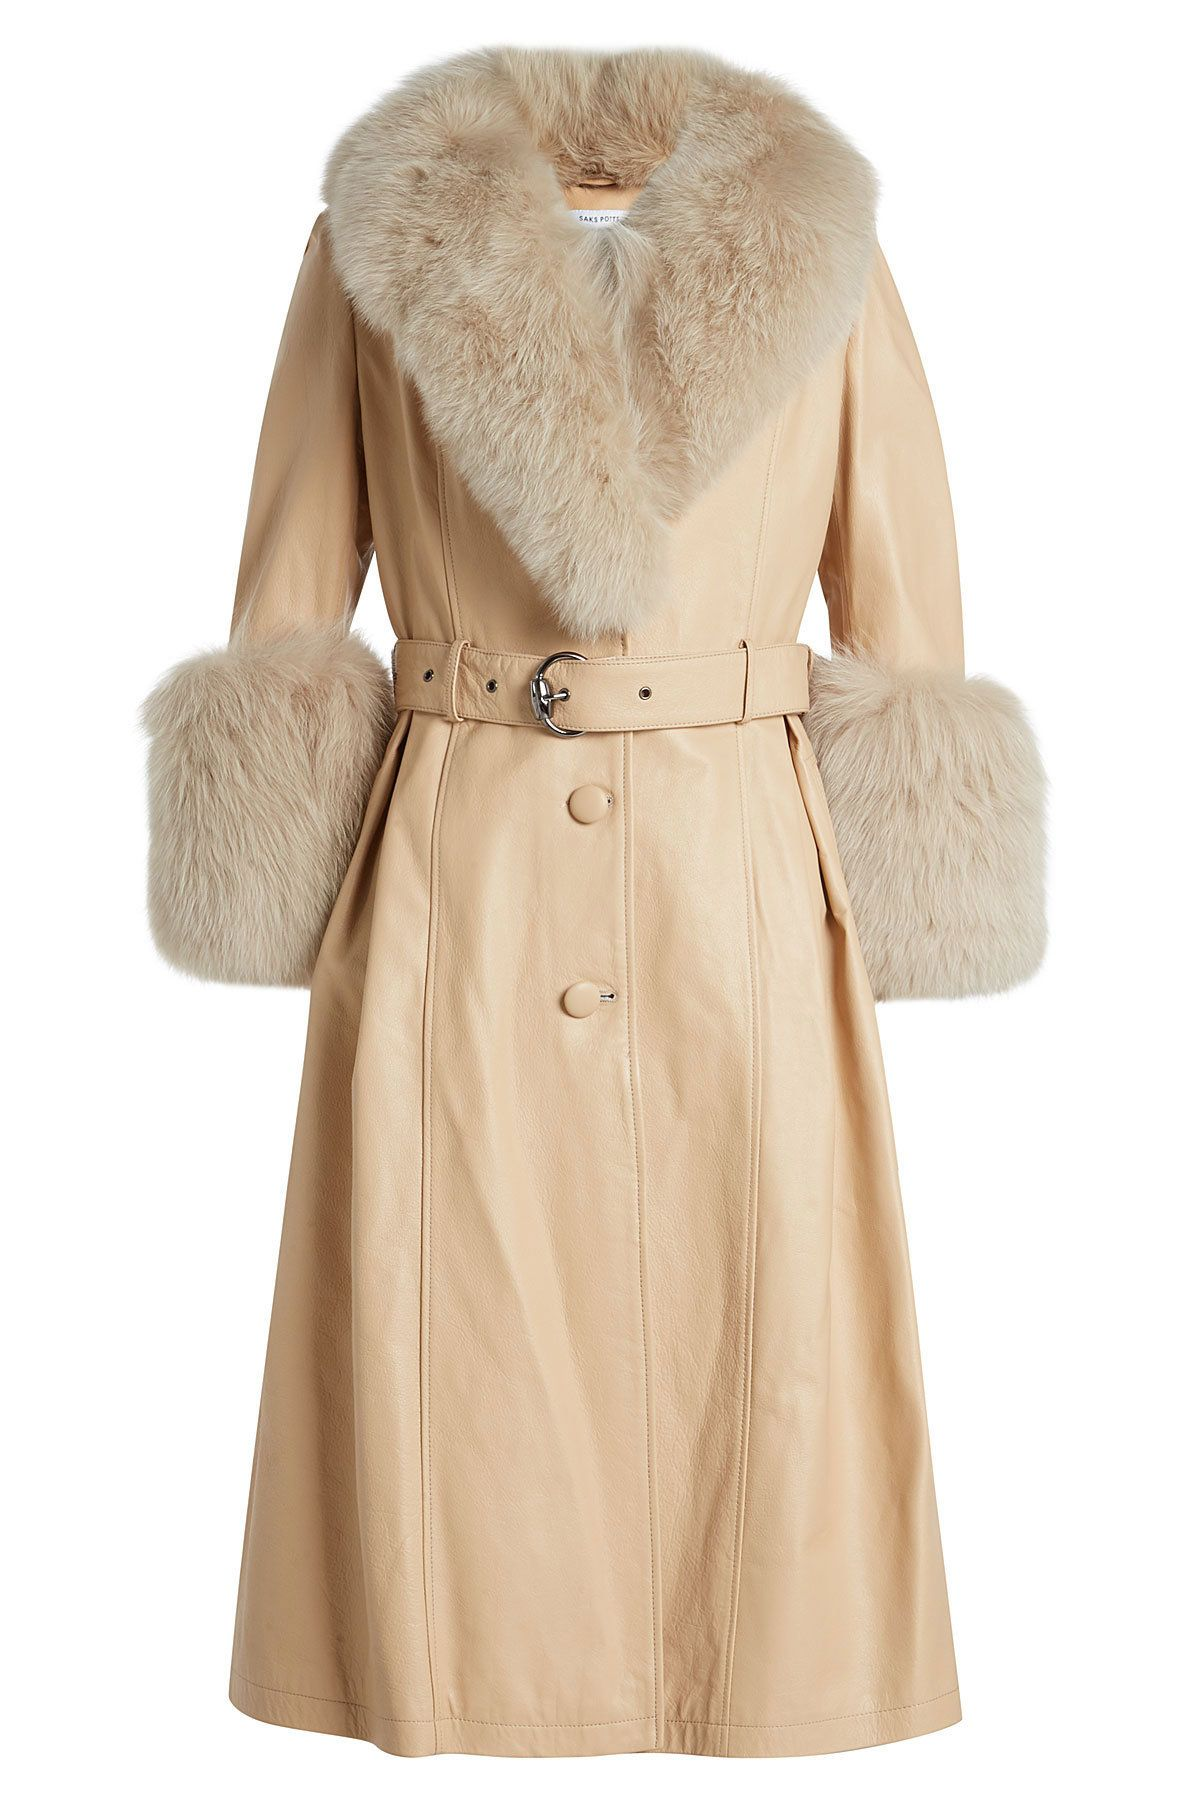 f3537858519c SAKS POTTS . #sakspotts #cloth #   Saks Potts in 2019   Coat, Saks ...